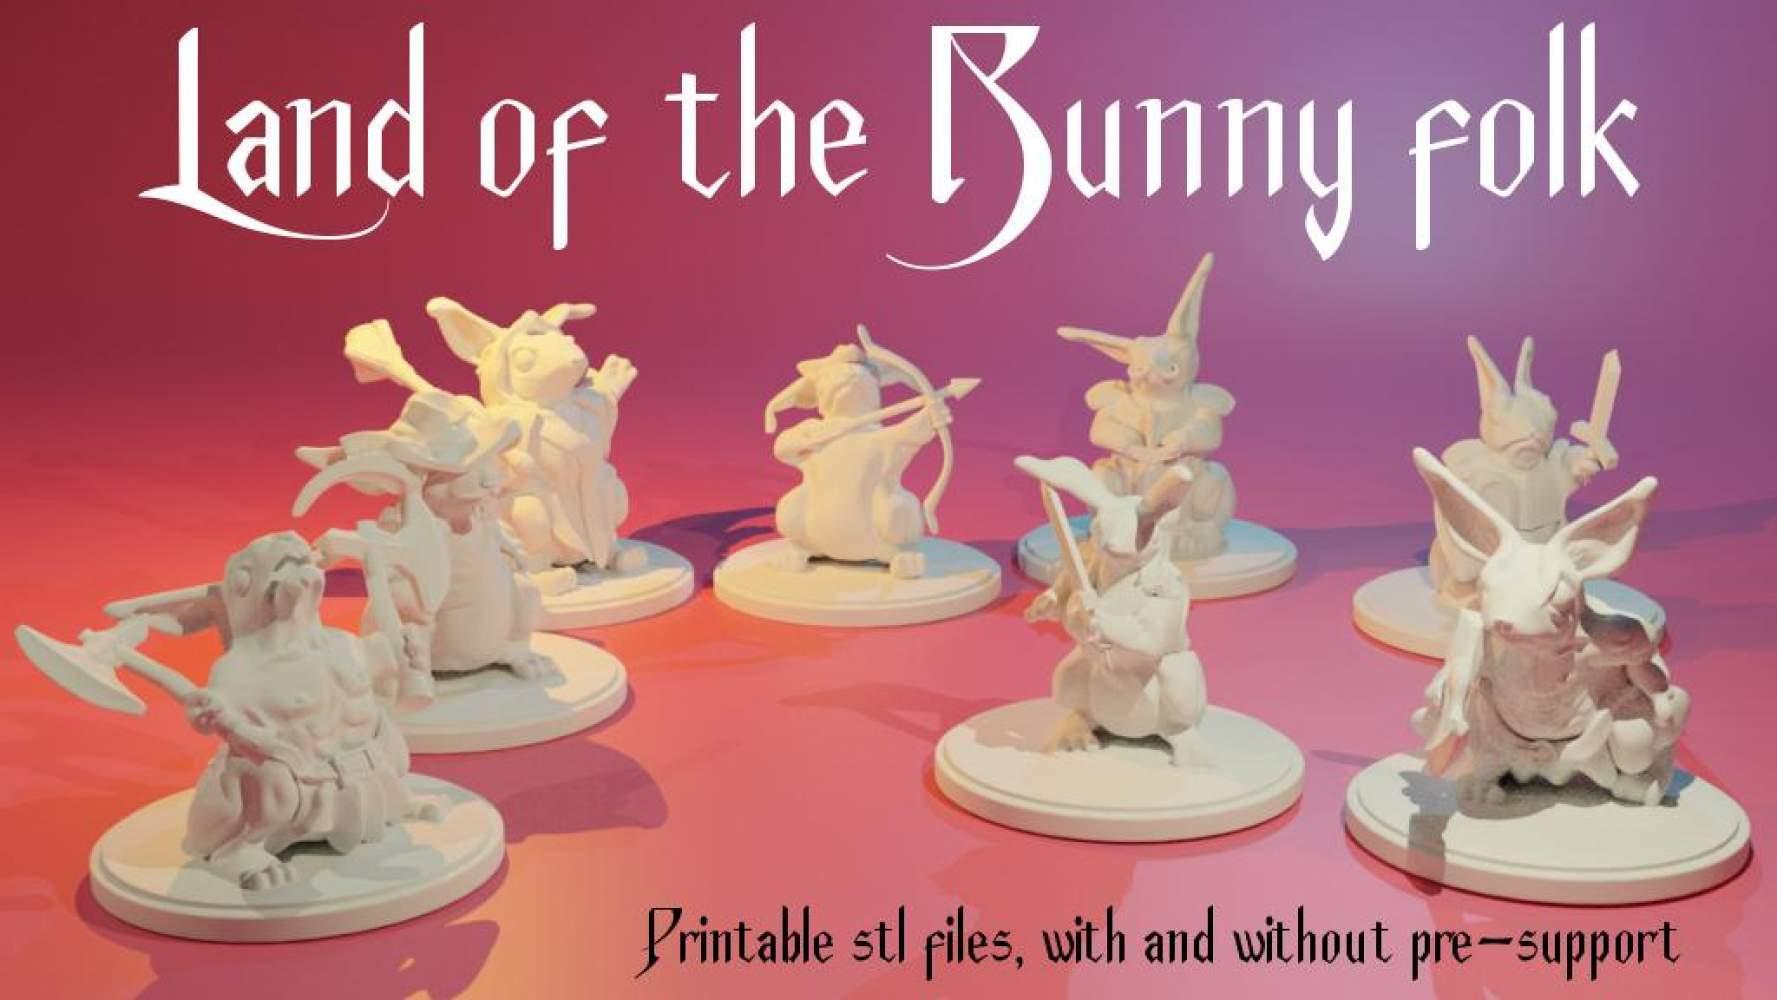 Land of the Bunny folk